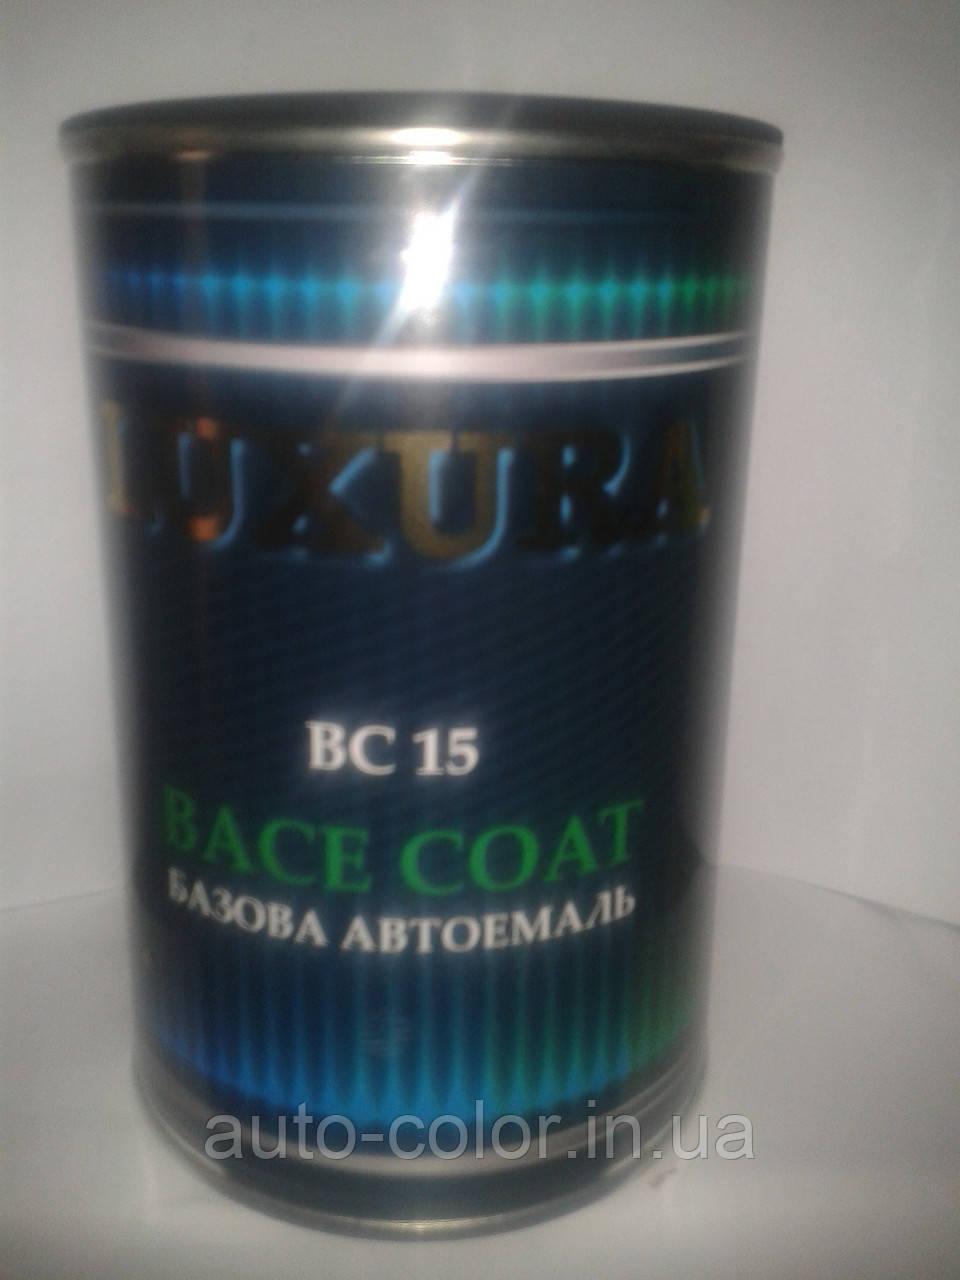 TOYOTA 202 чорна Базова автоемаль Luxura 1 л